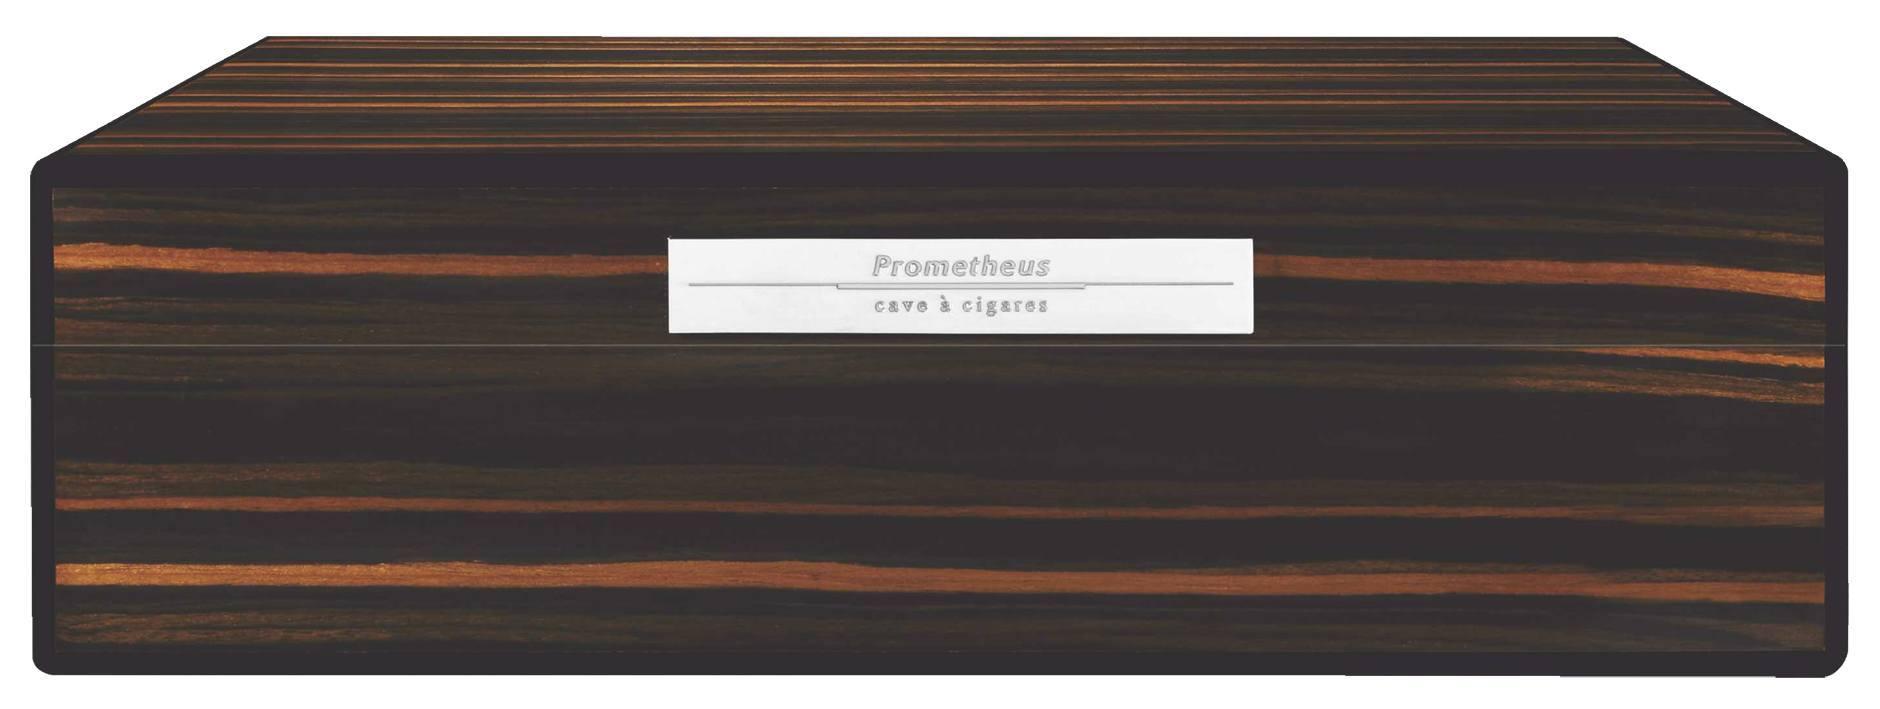 Prometheus Milano Series 2014 Macassar Ebony